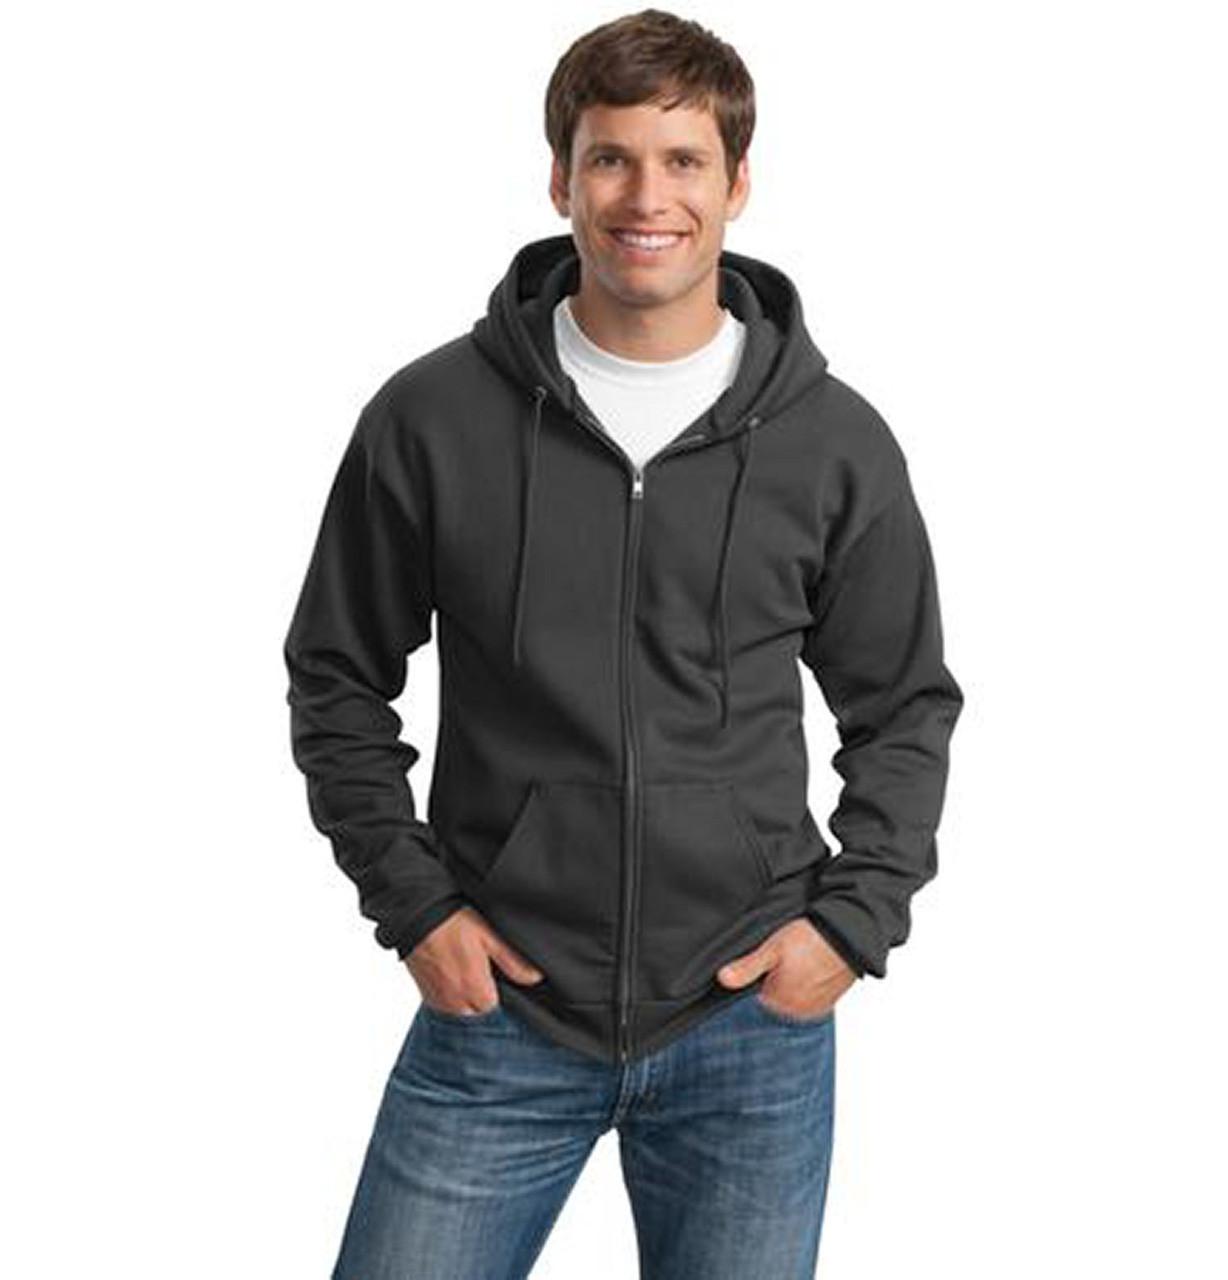 Maroon Port /& Company Classic Pullover Hooded Sweatshirt-S